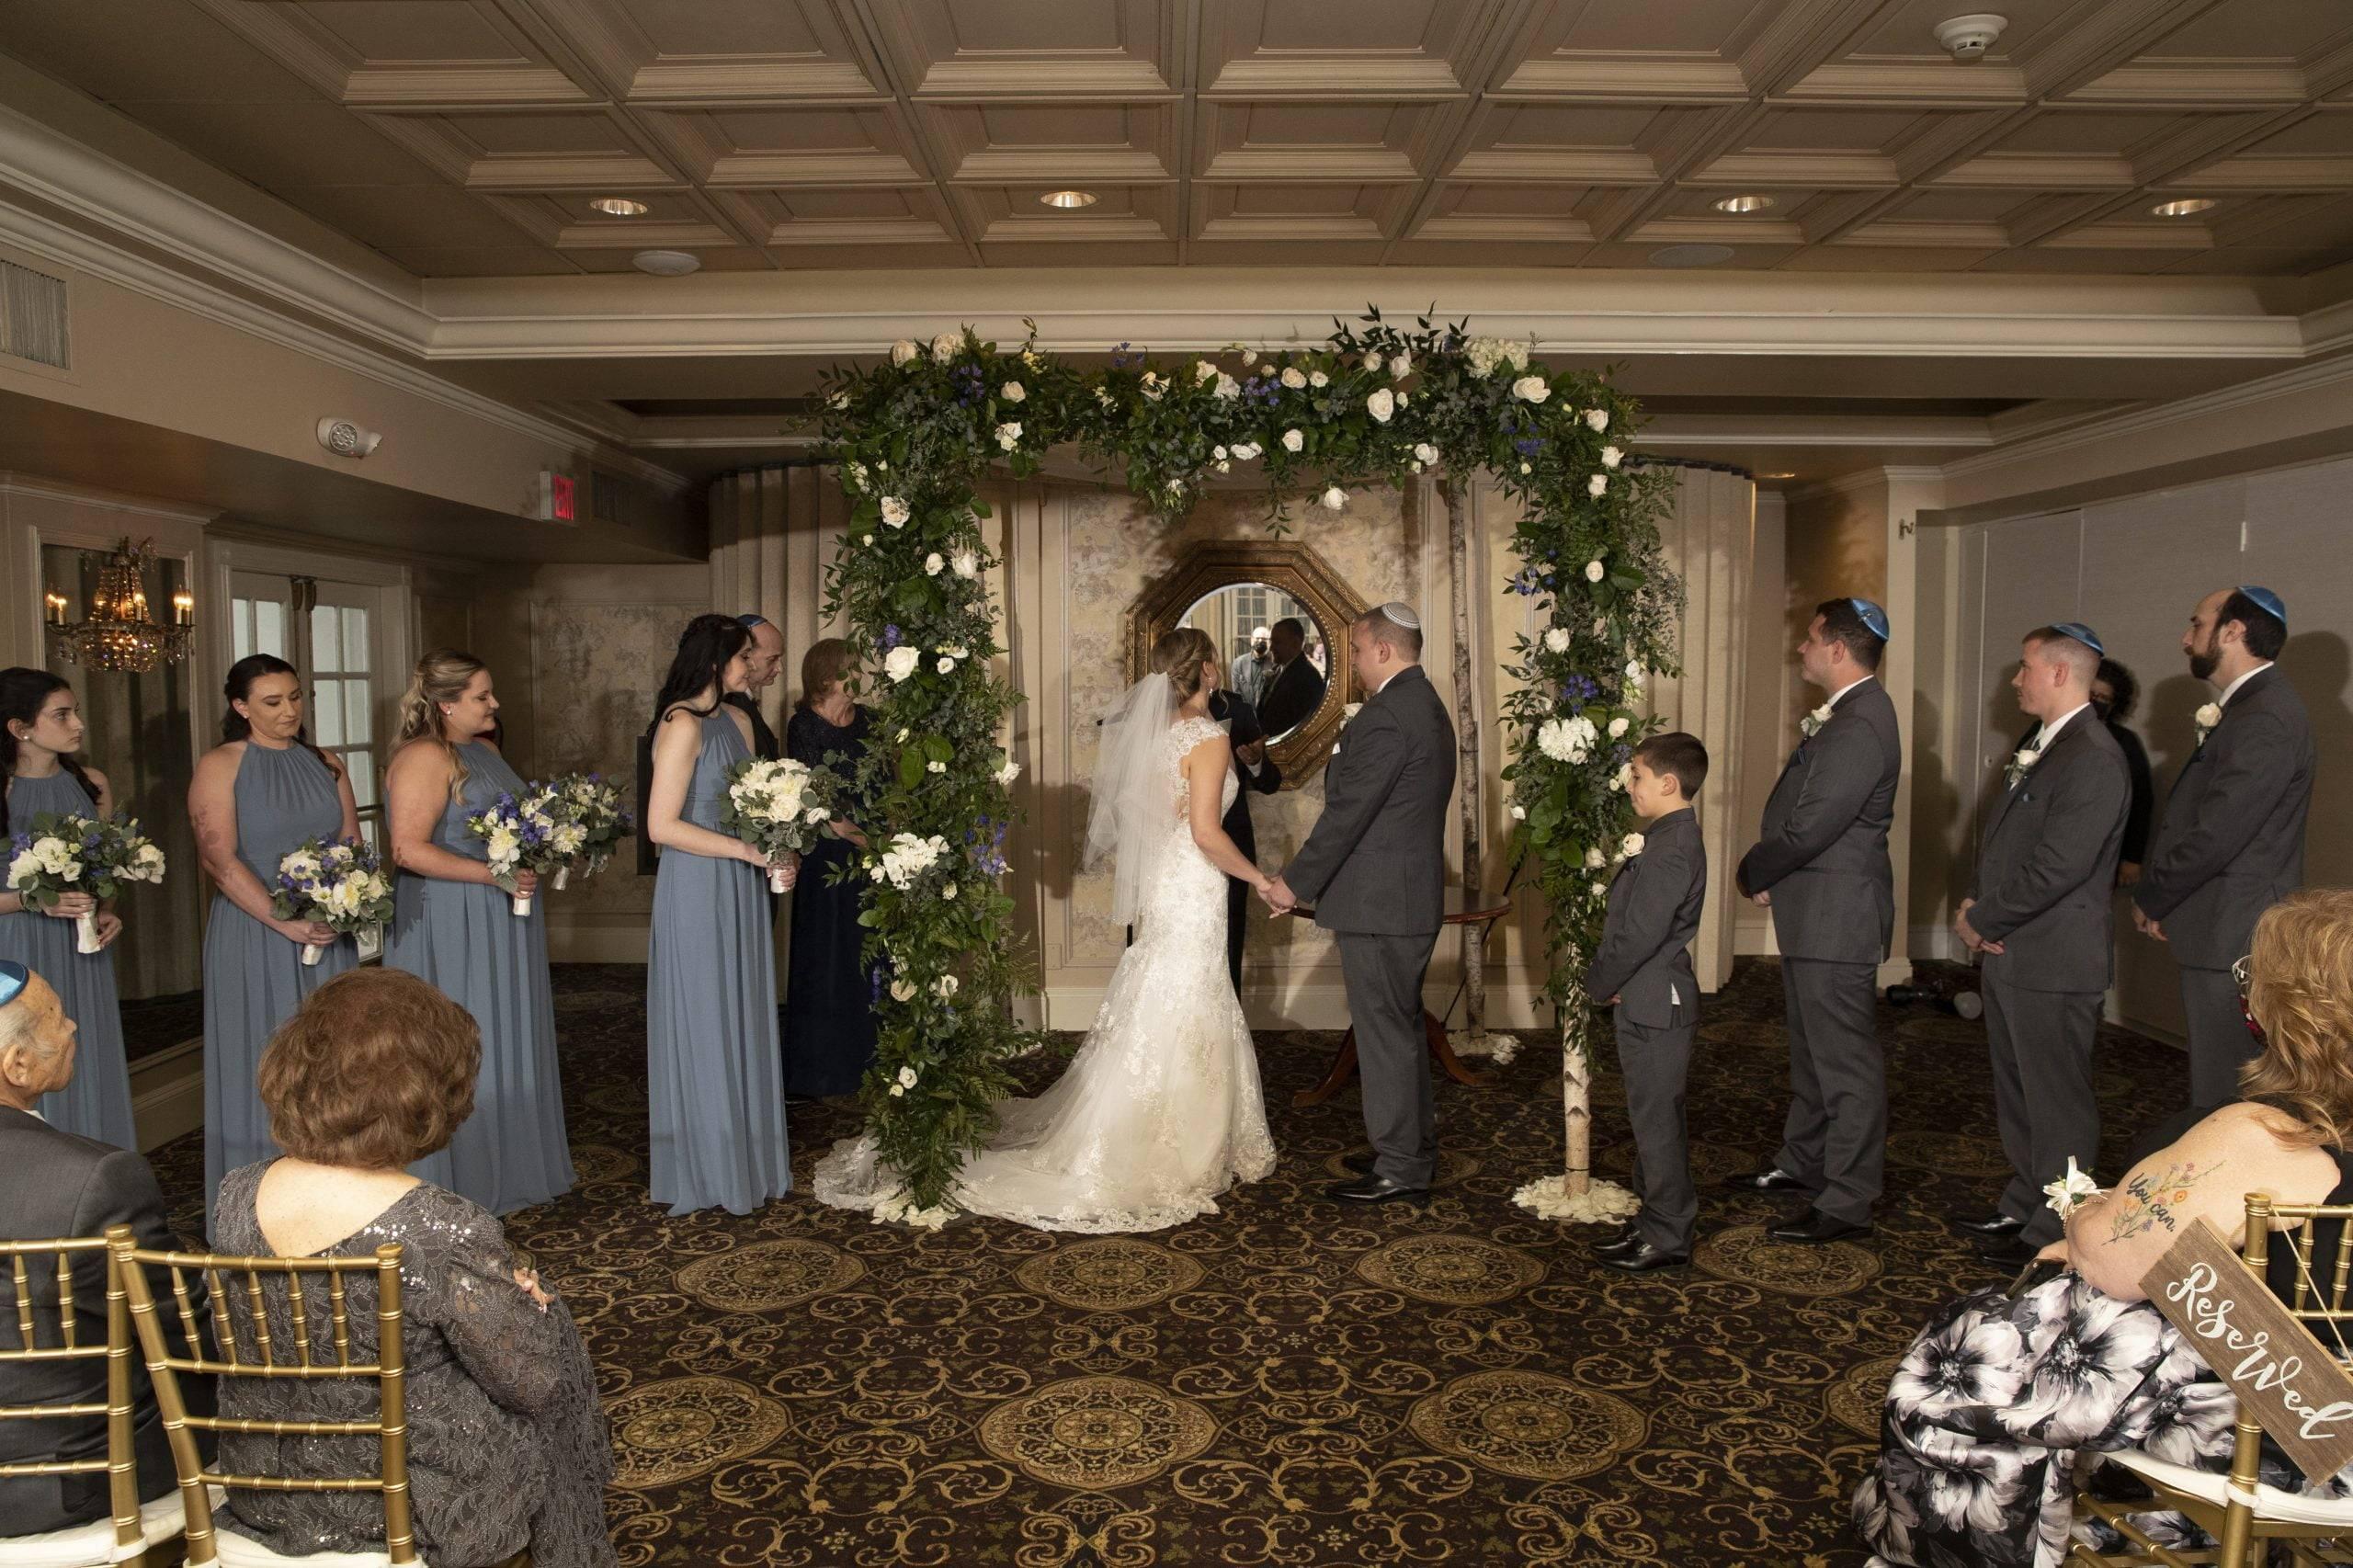 Olde Mill Inn wedding ceremony indoors